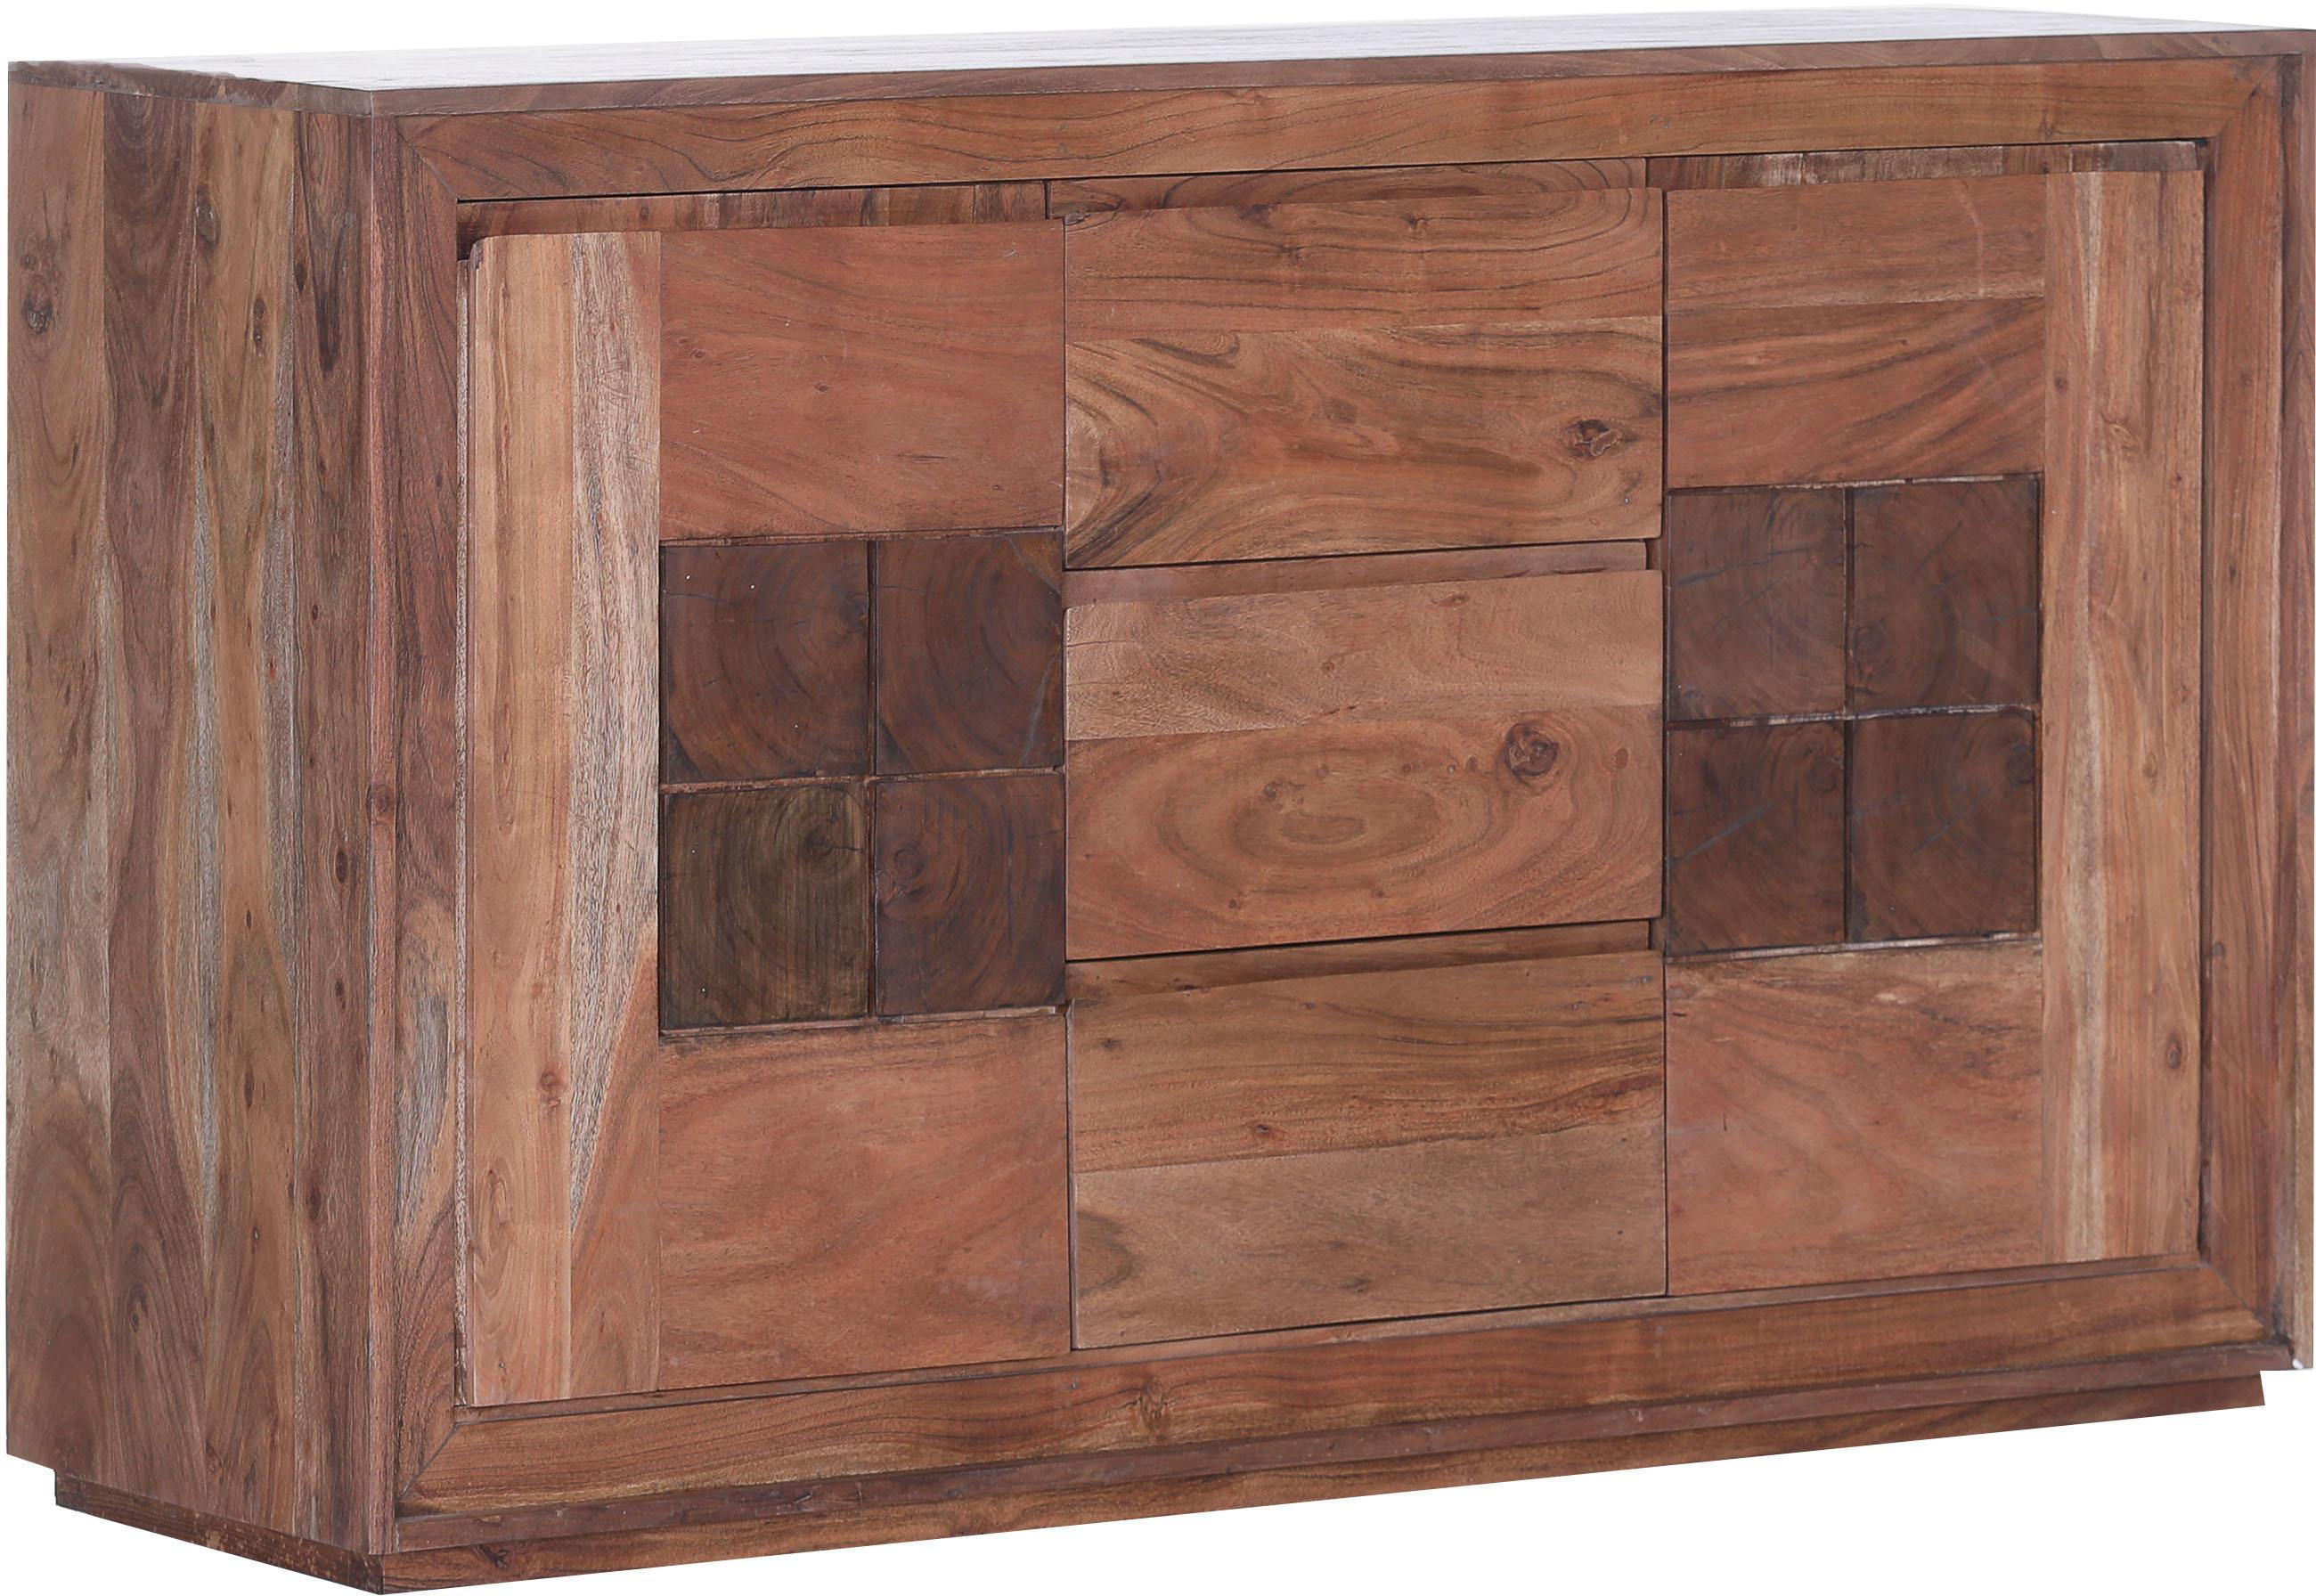 Gutmann Factory Sideboard Timber